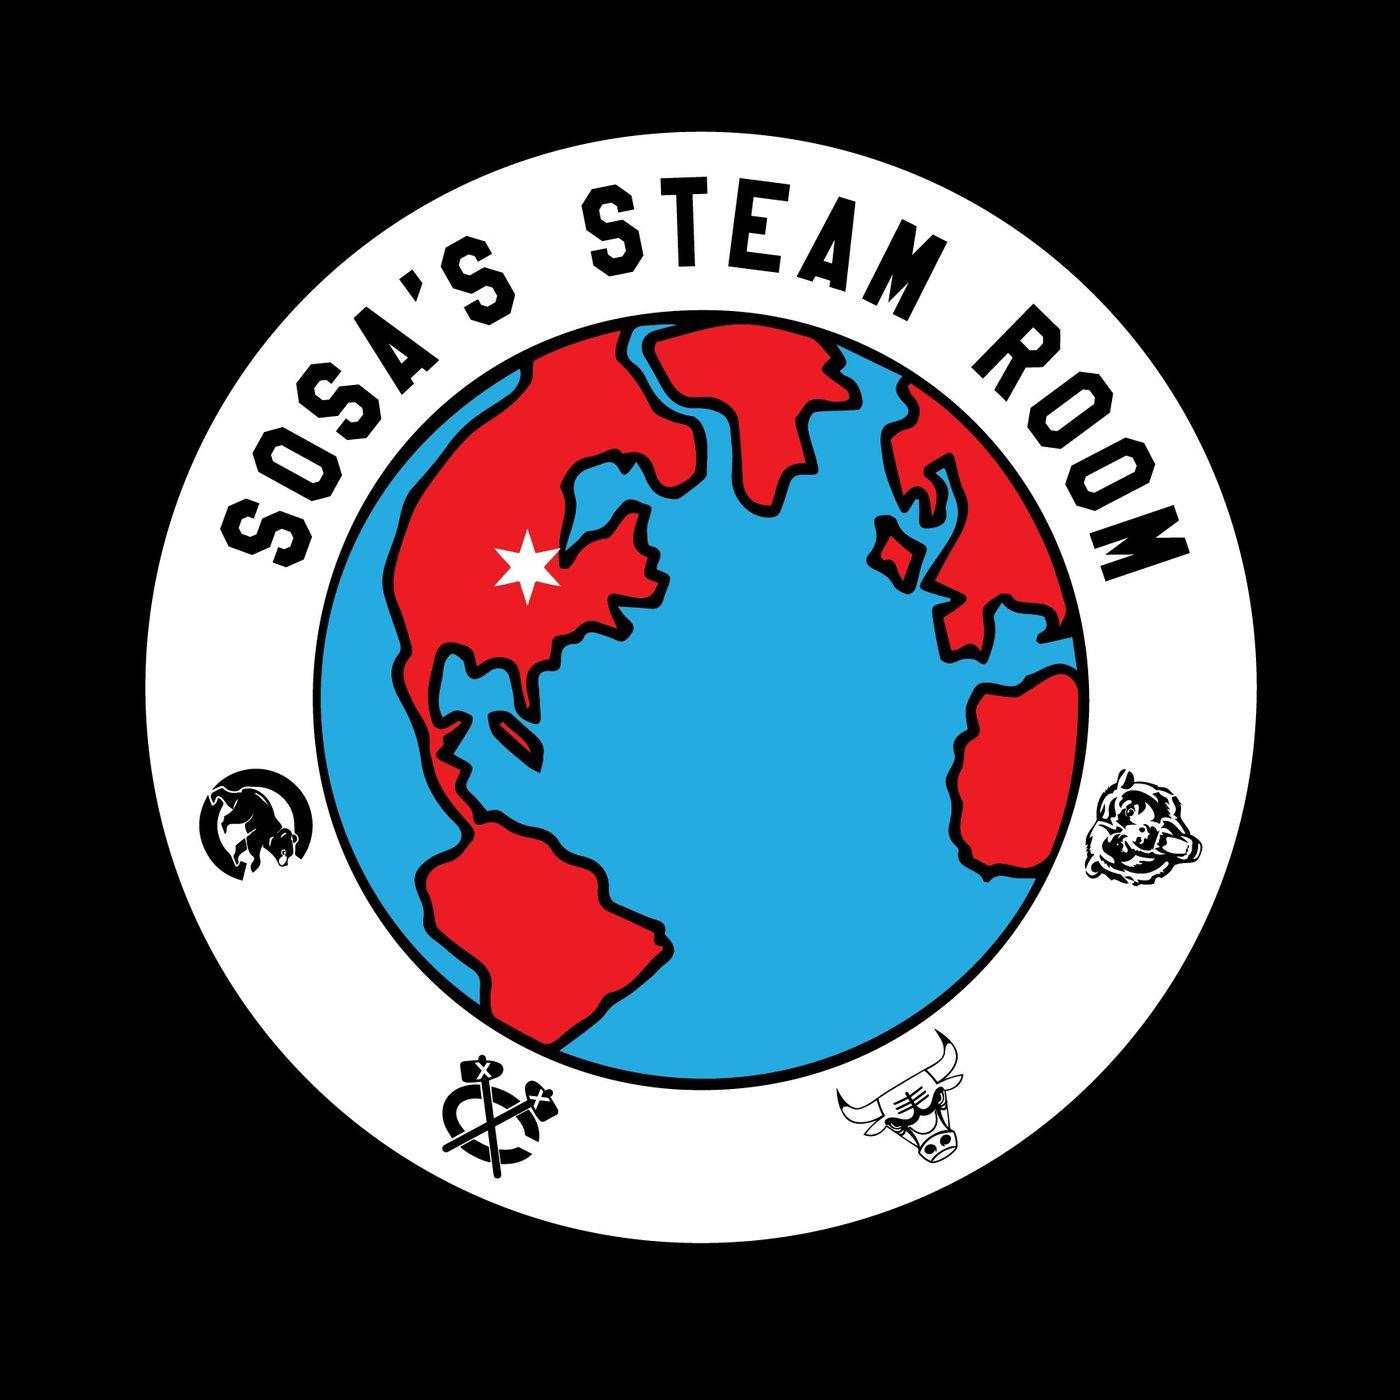 Sosa's Steam Room